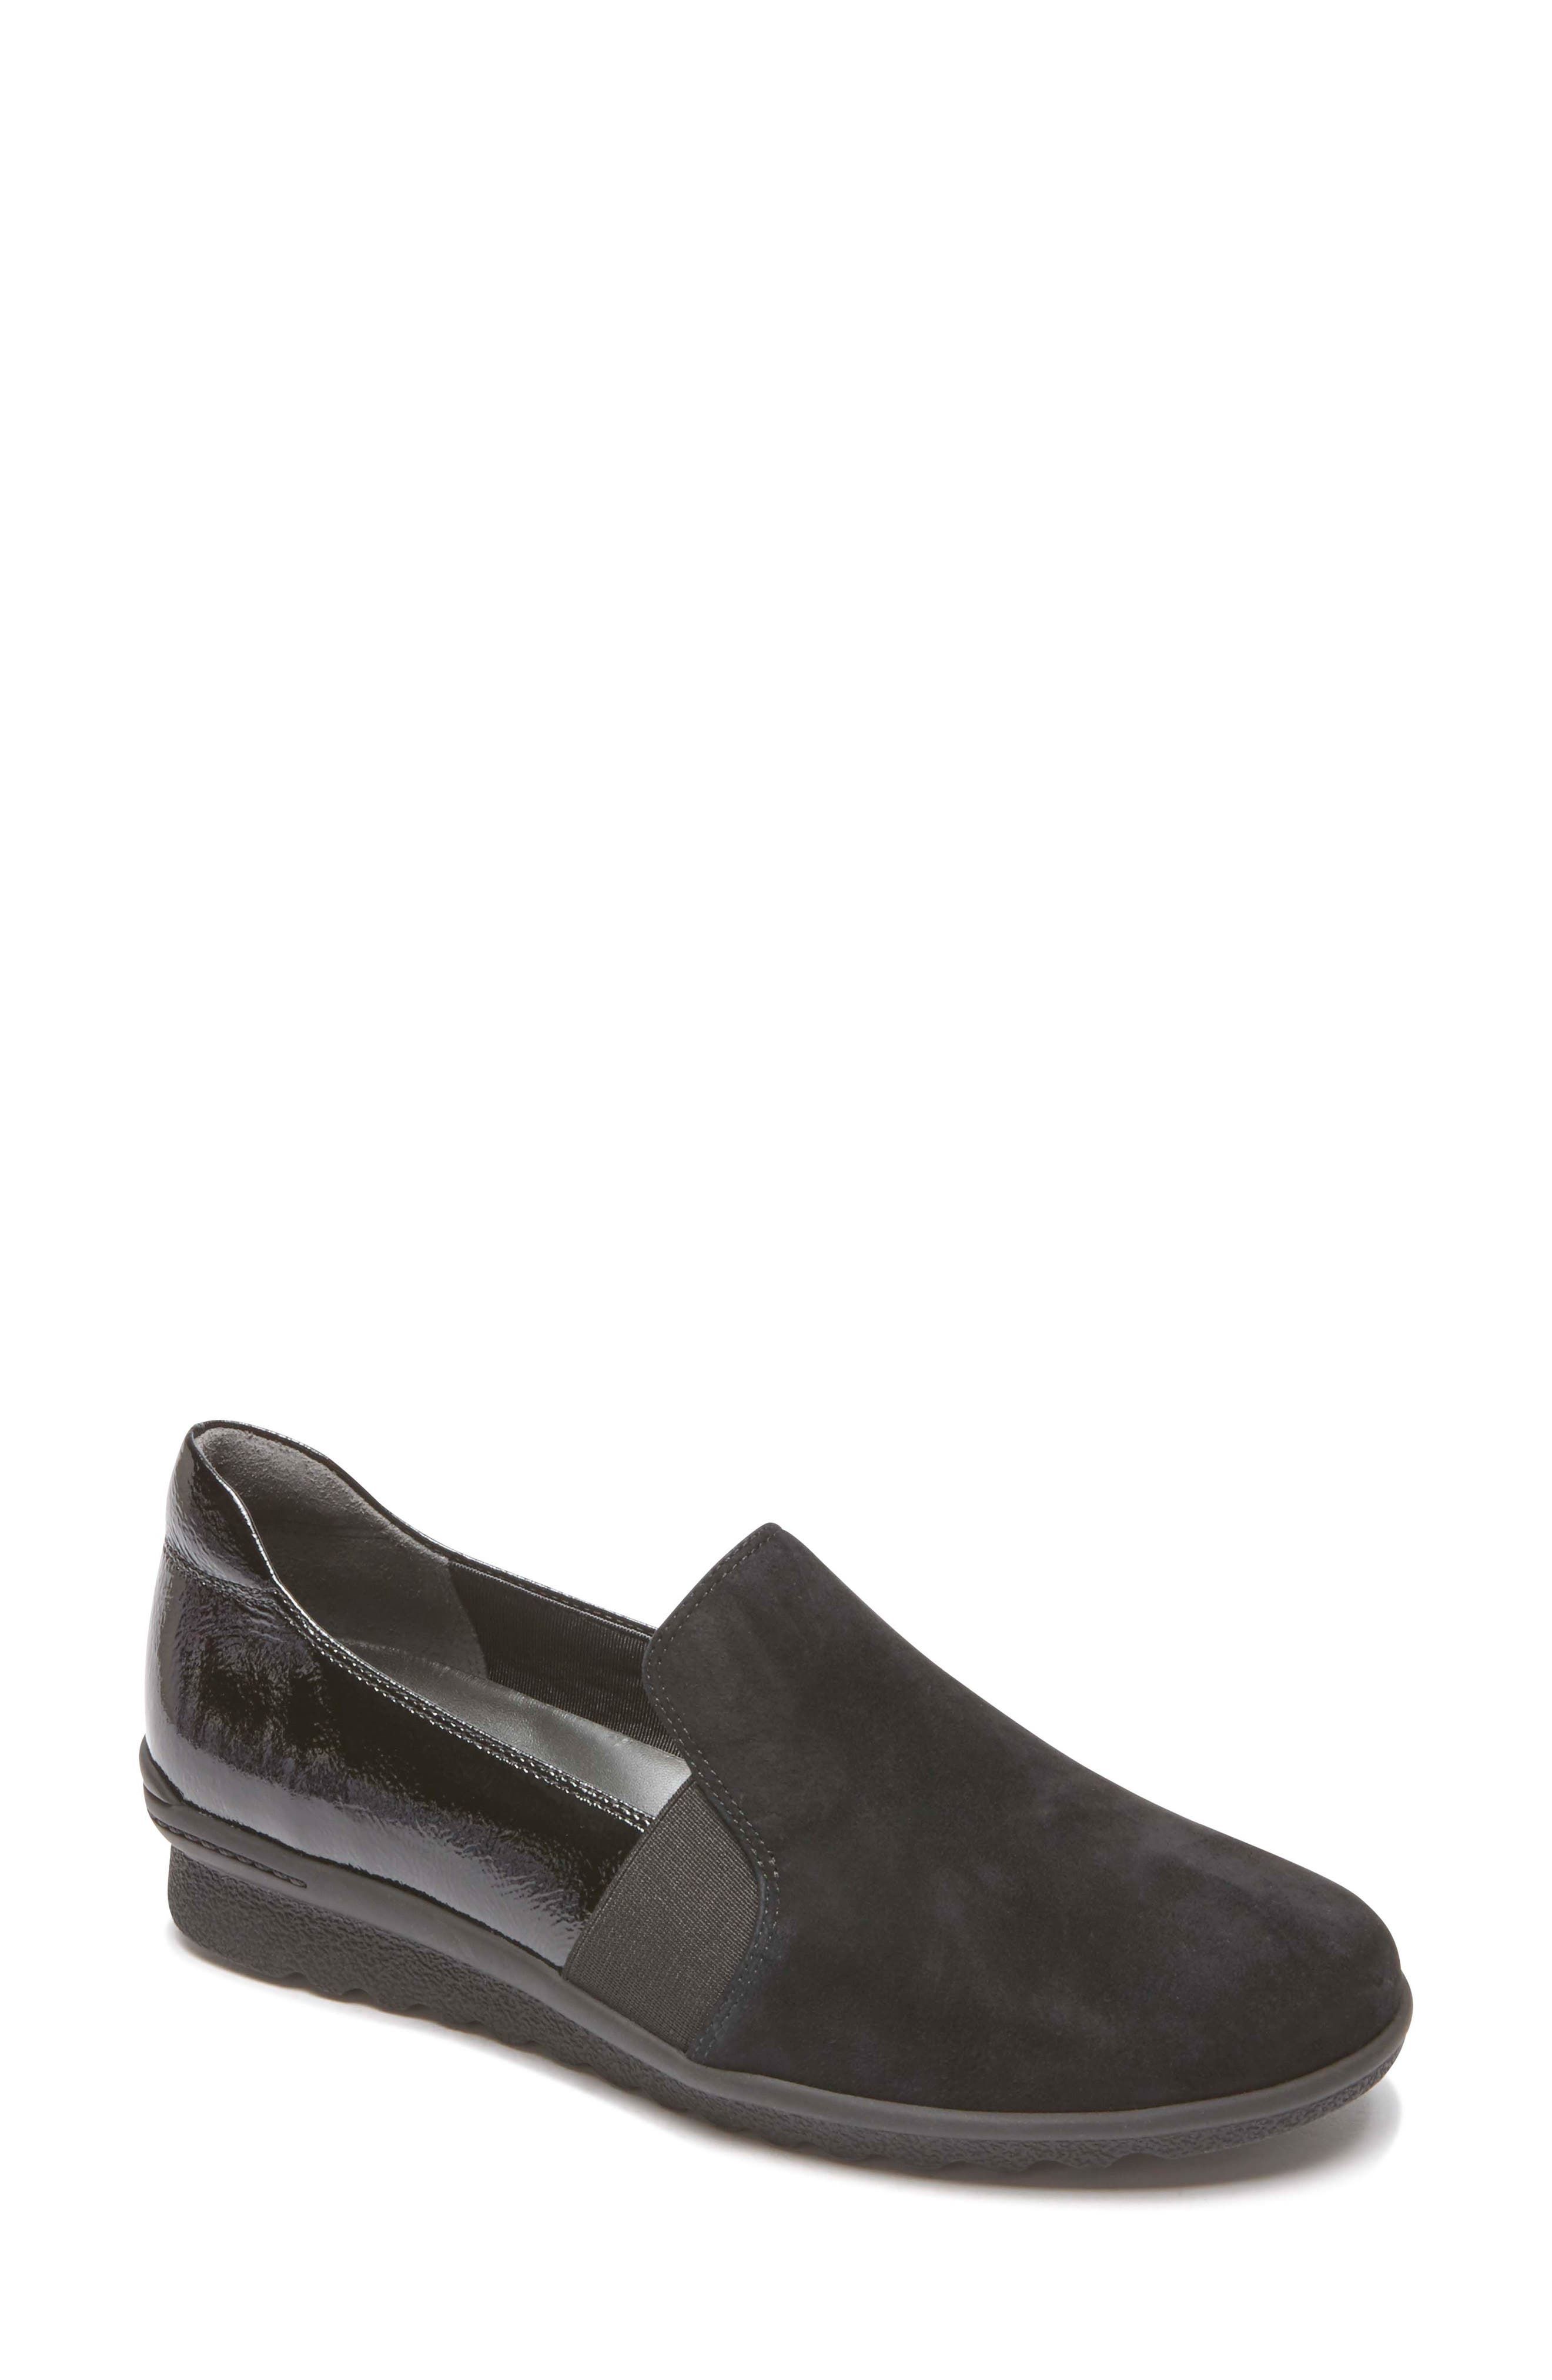 Rockport Chenole Loafer W - Black